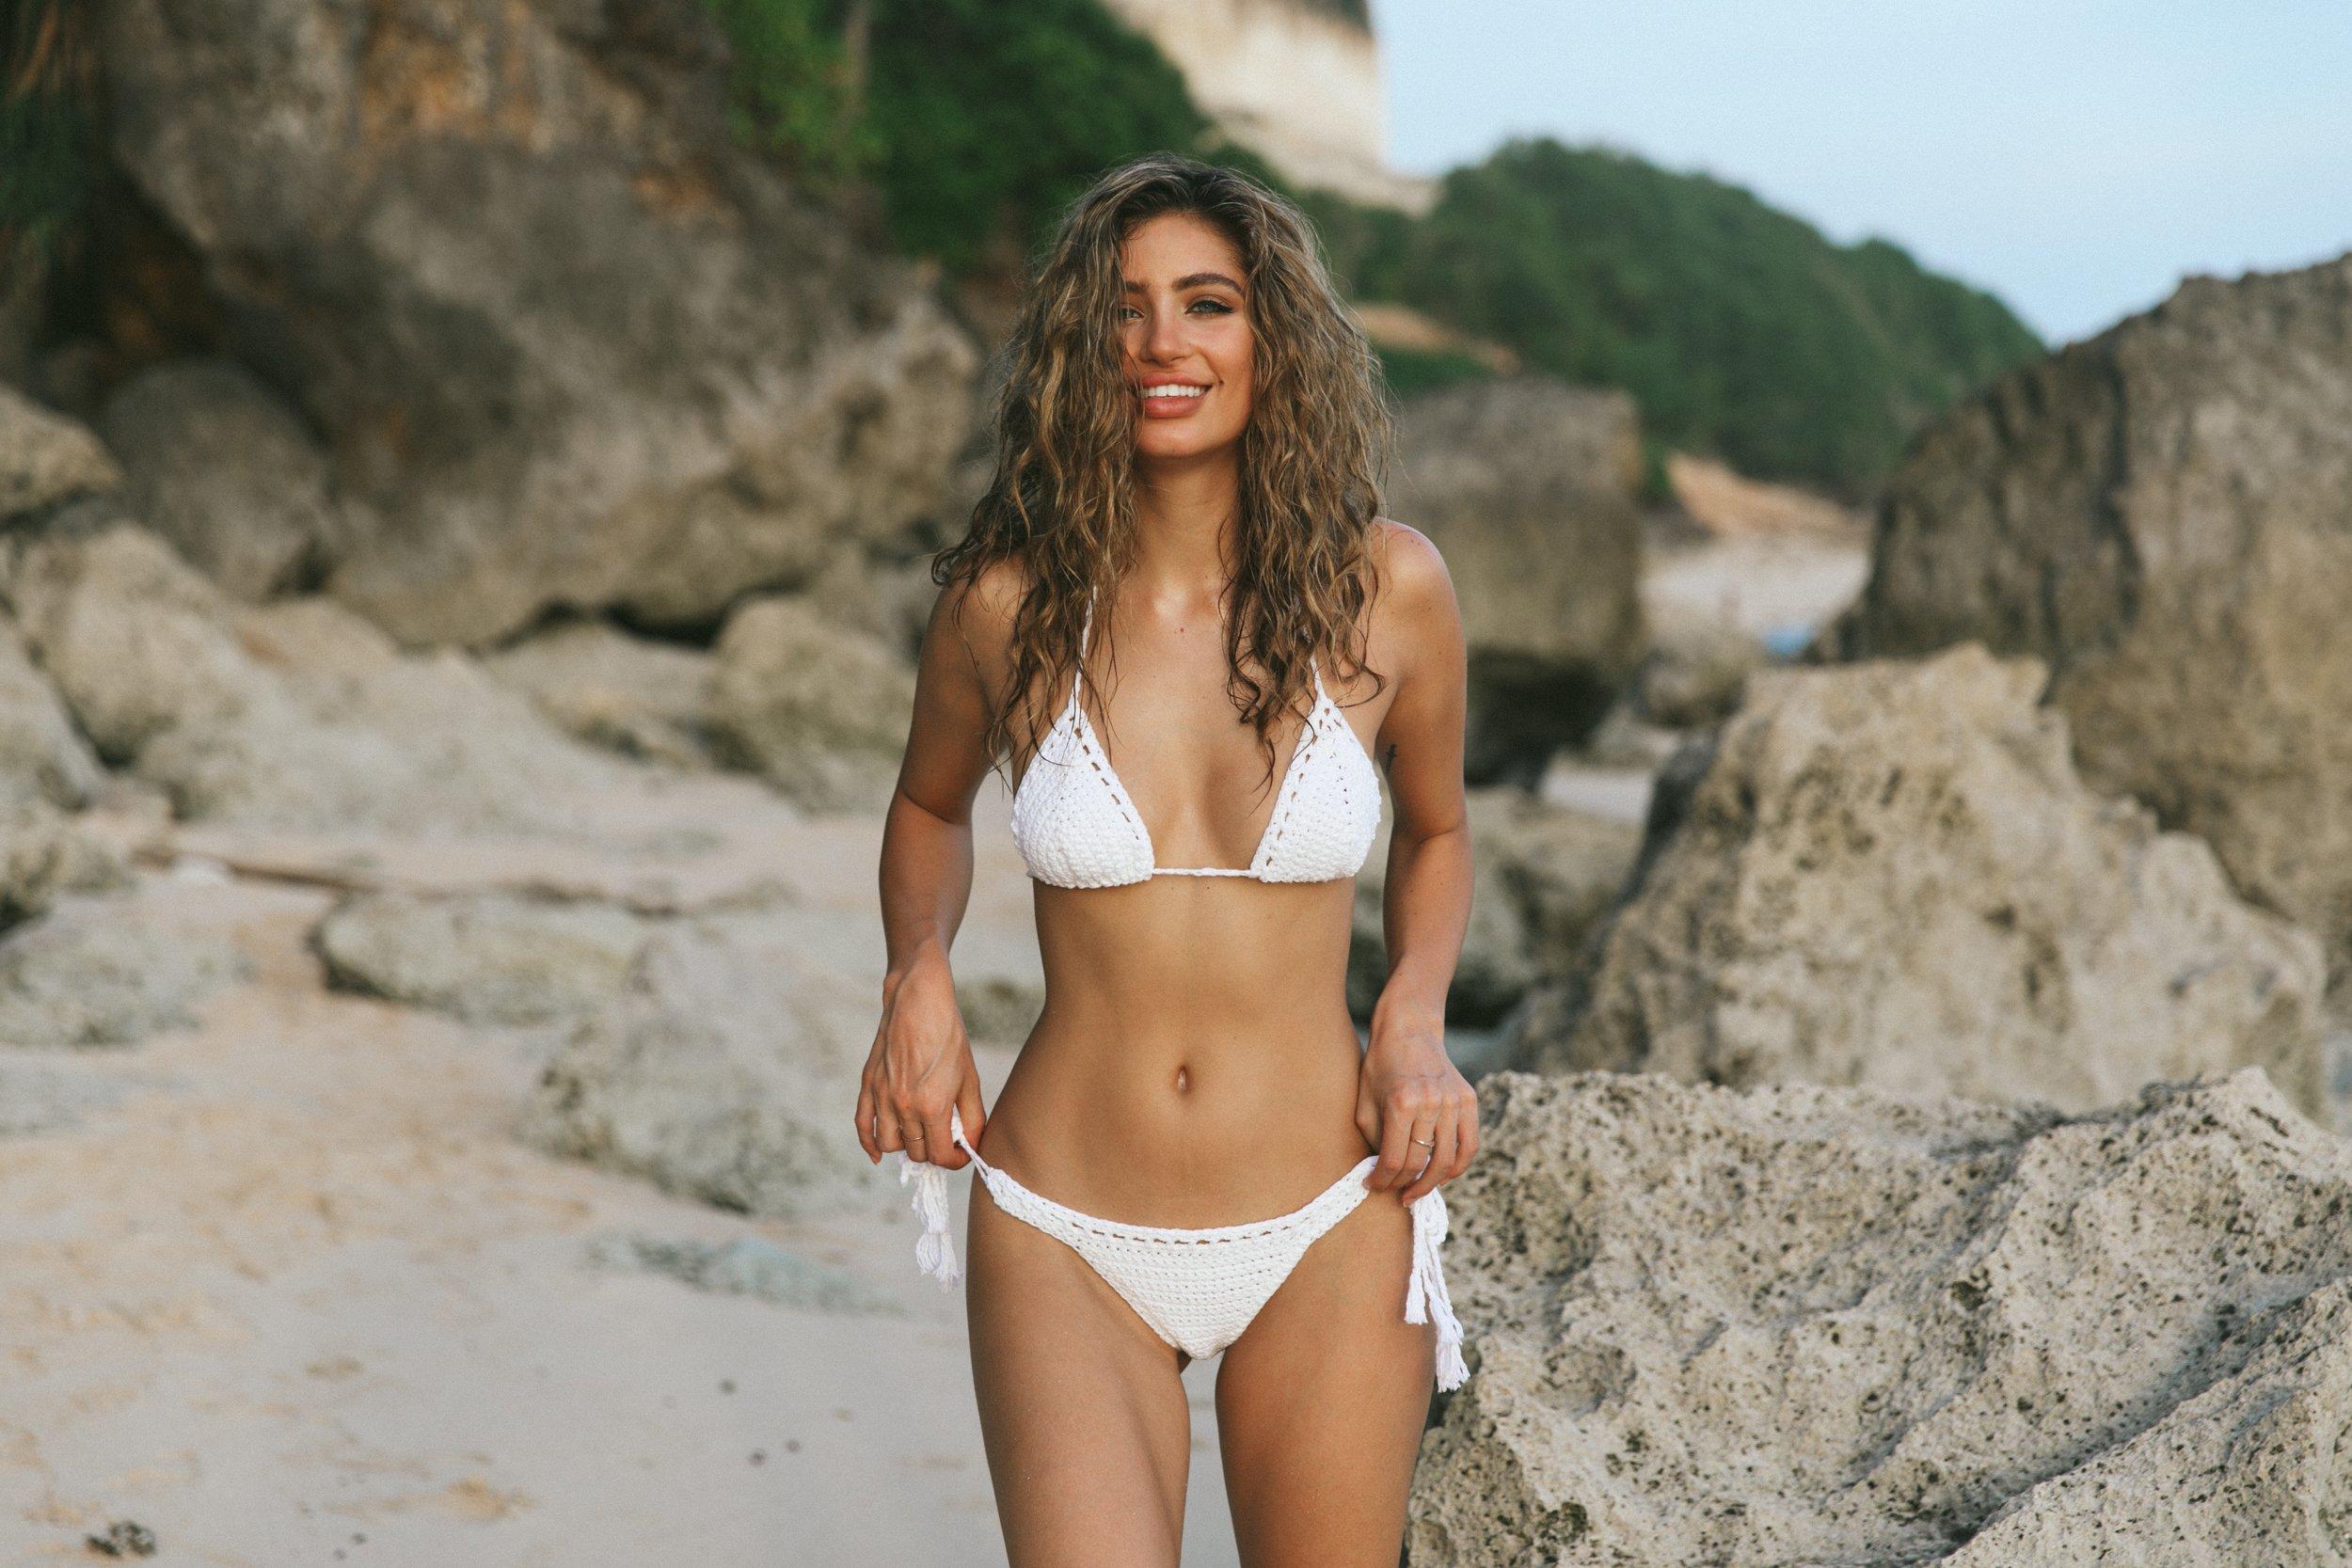 Bikini Belle Lucia nude (82 foto and video), Sexy, Paparazzi, Instagram, braless 2019